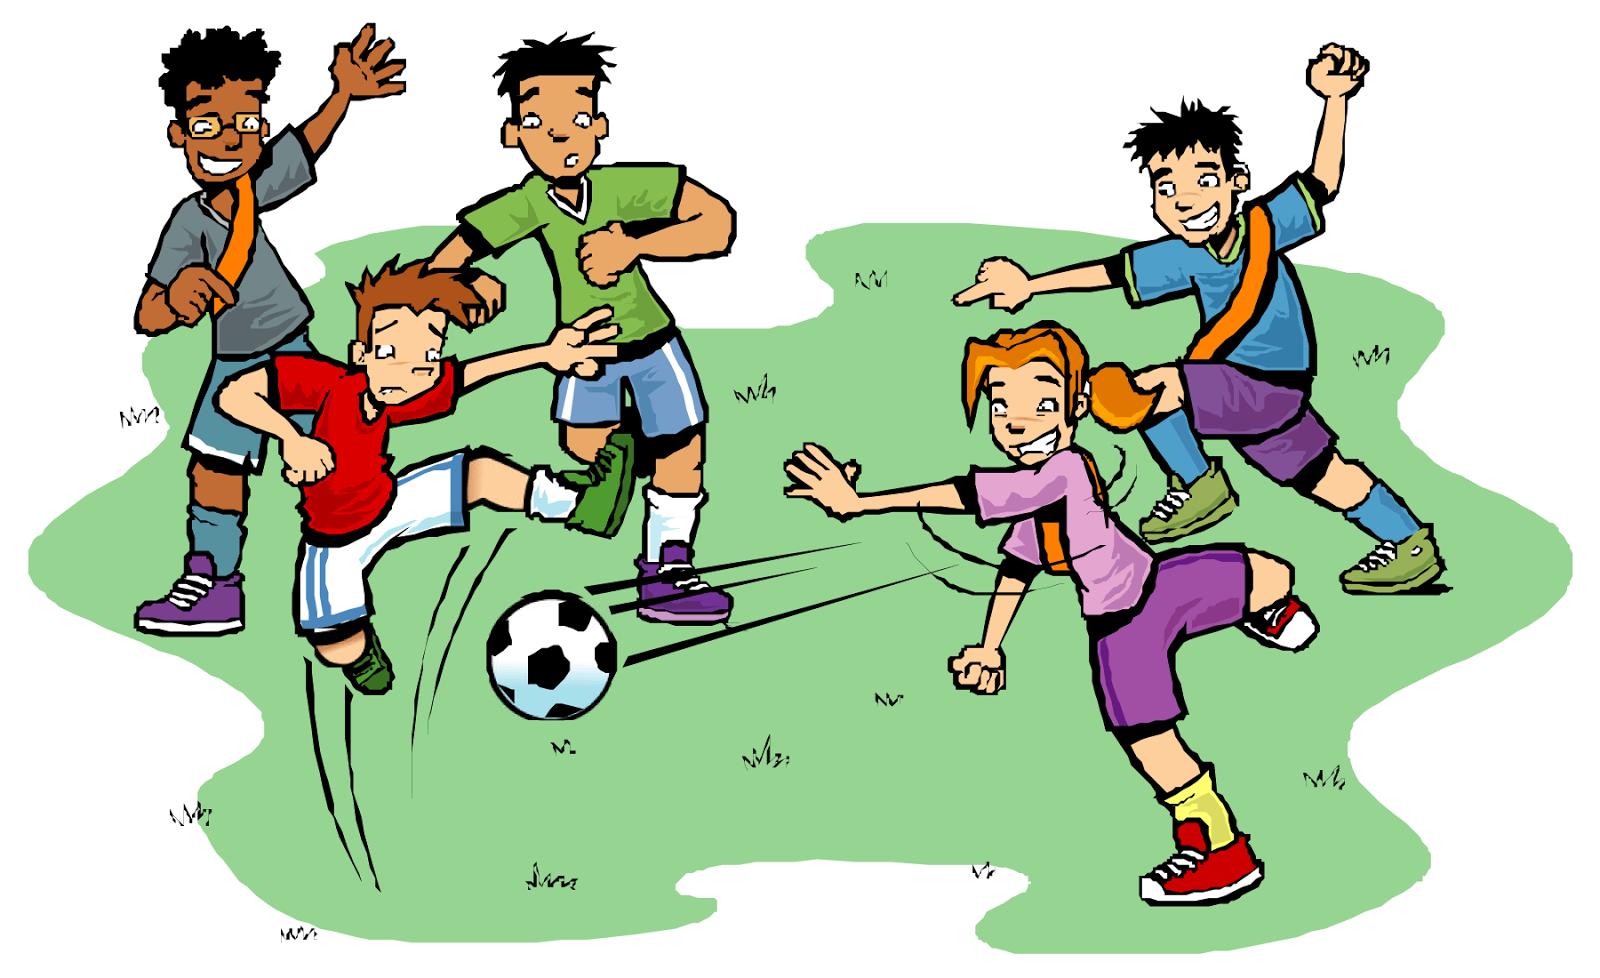 Mirzan Blog S Paling Keren Gambar Animasi Kartun Yang Sedang Bermain Futsal